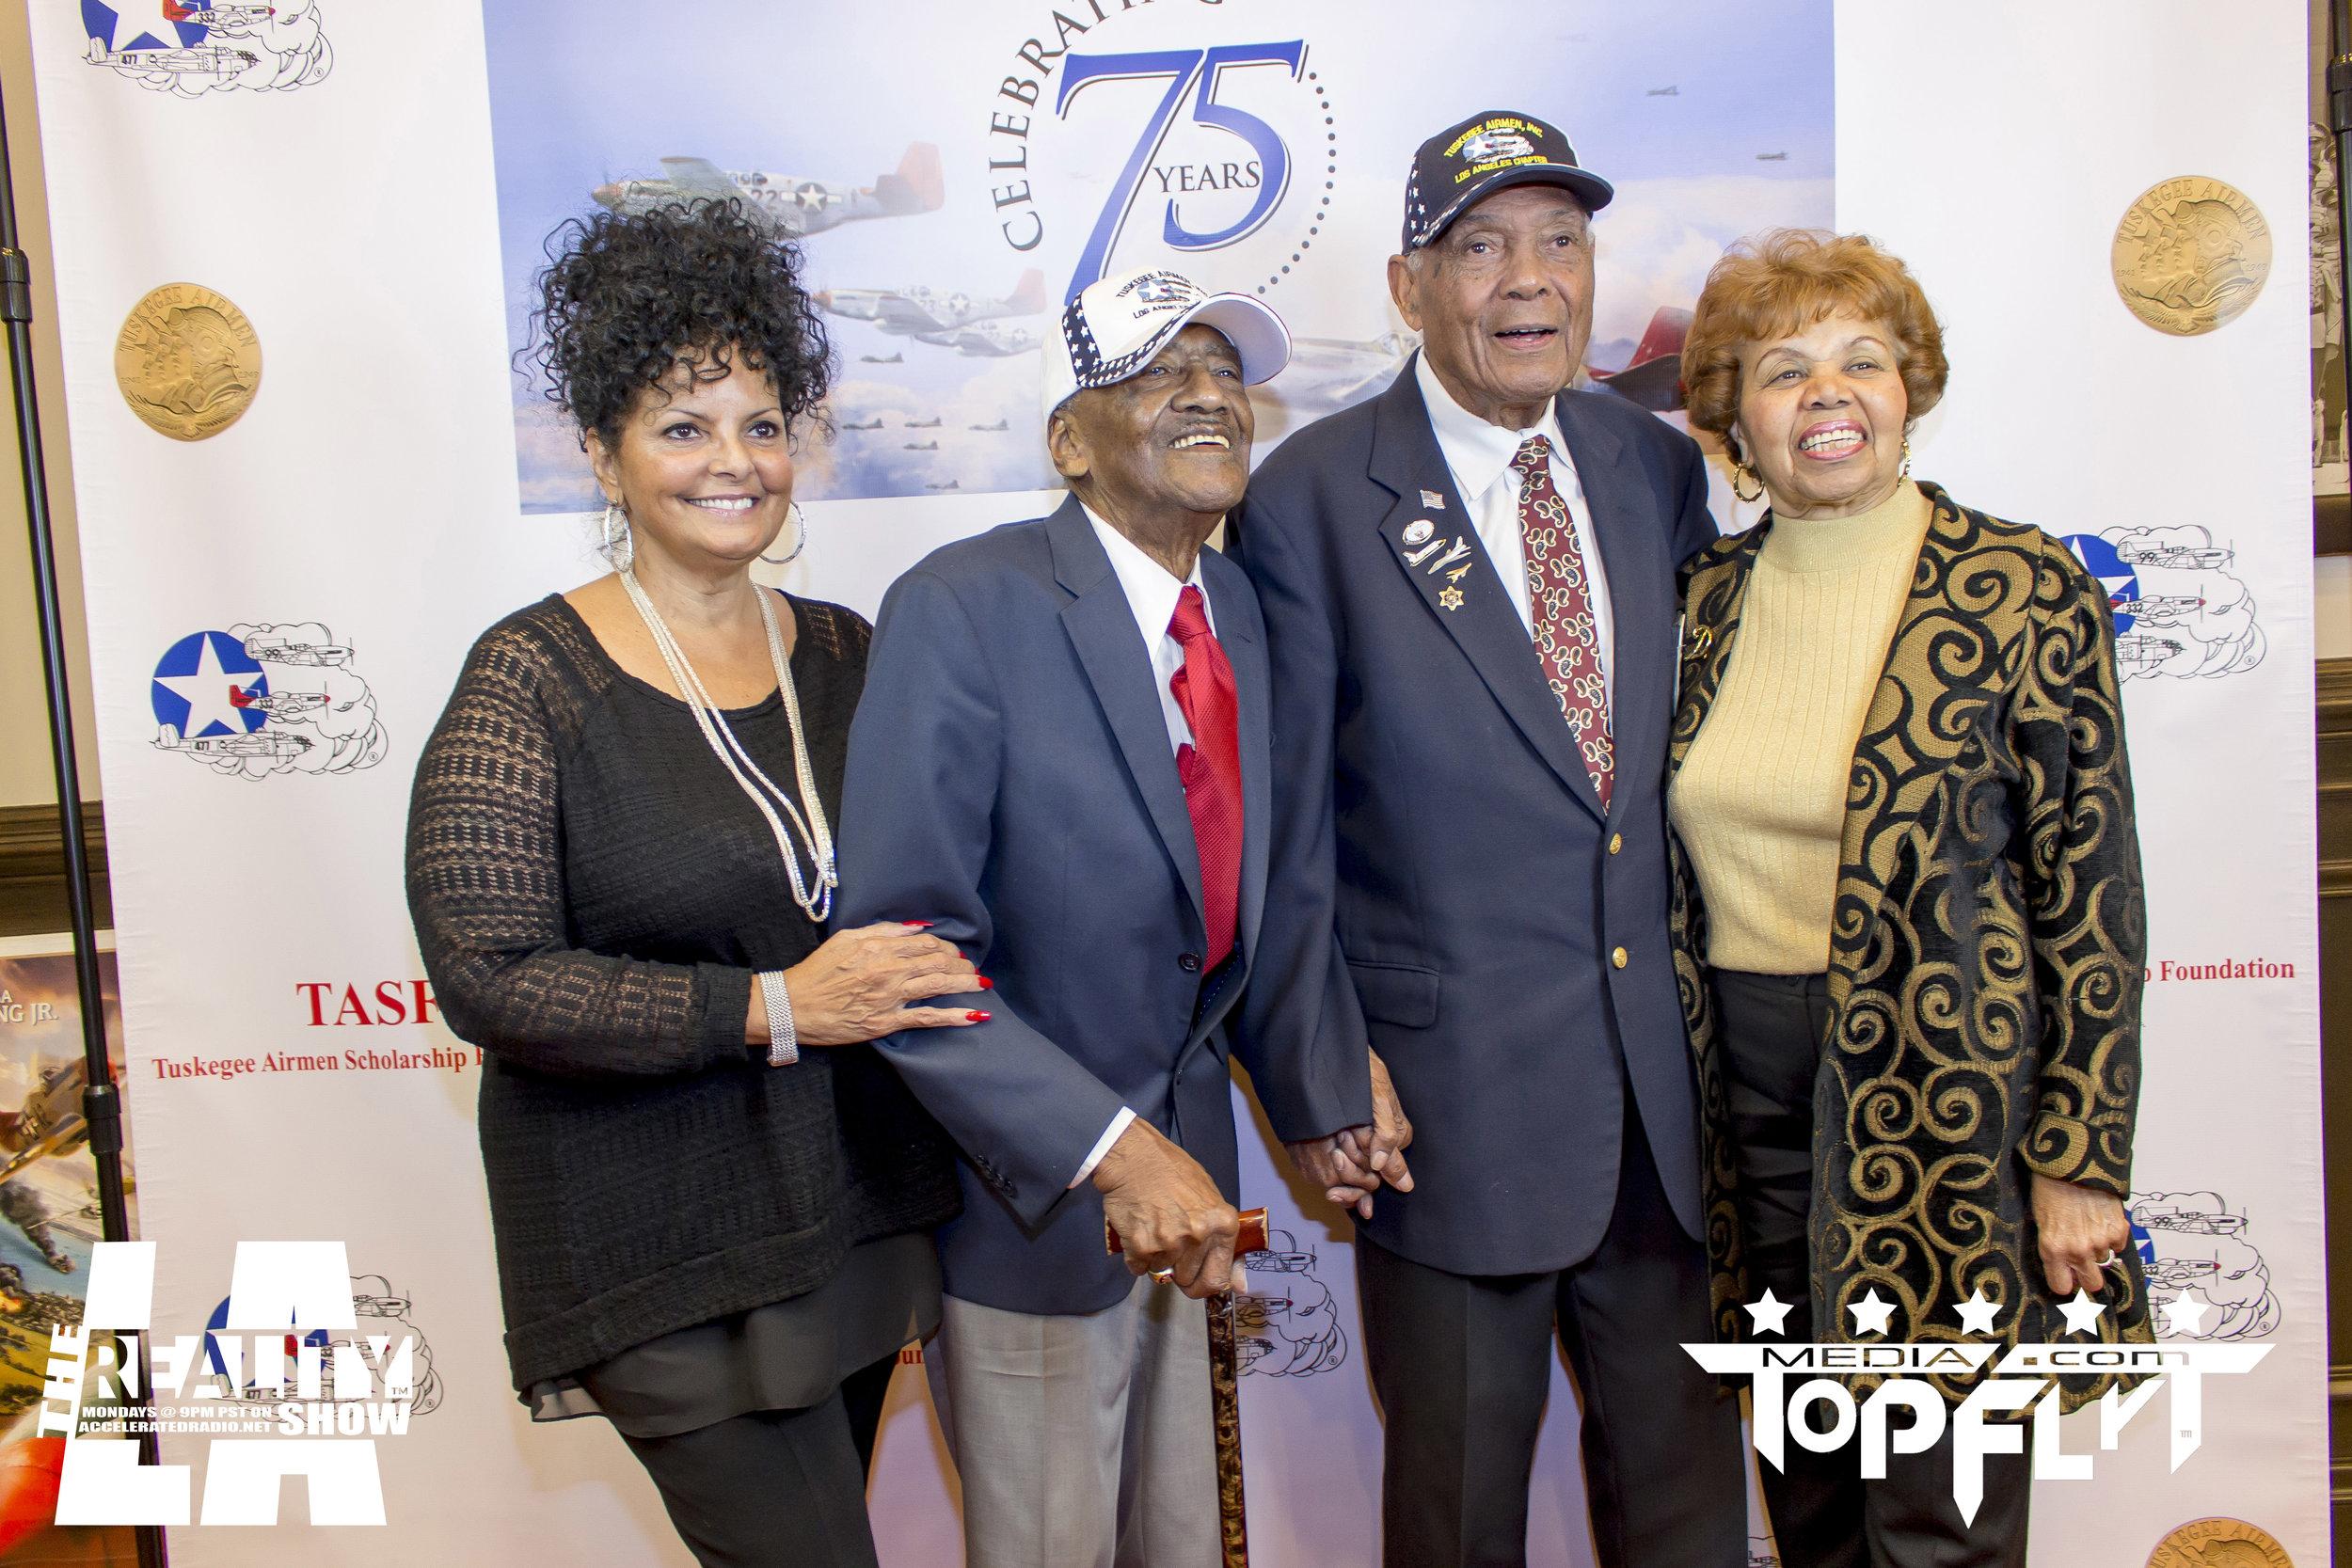 The Reality Show LA - Tuskegee Airmen 75th Anniversary VIP Reception_31.jpg